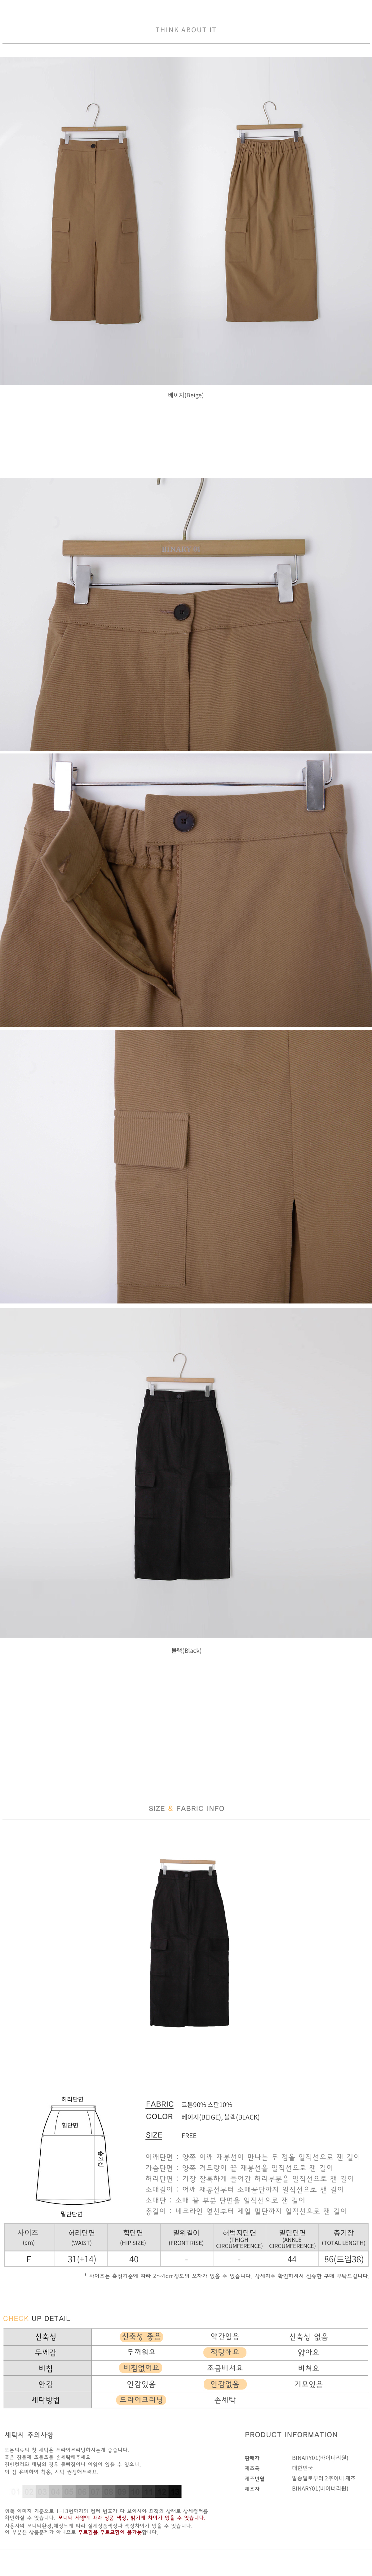 Peach Creaming Cargo Skirt